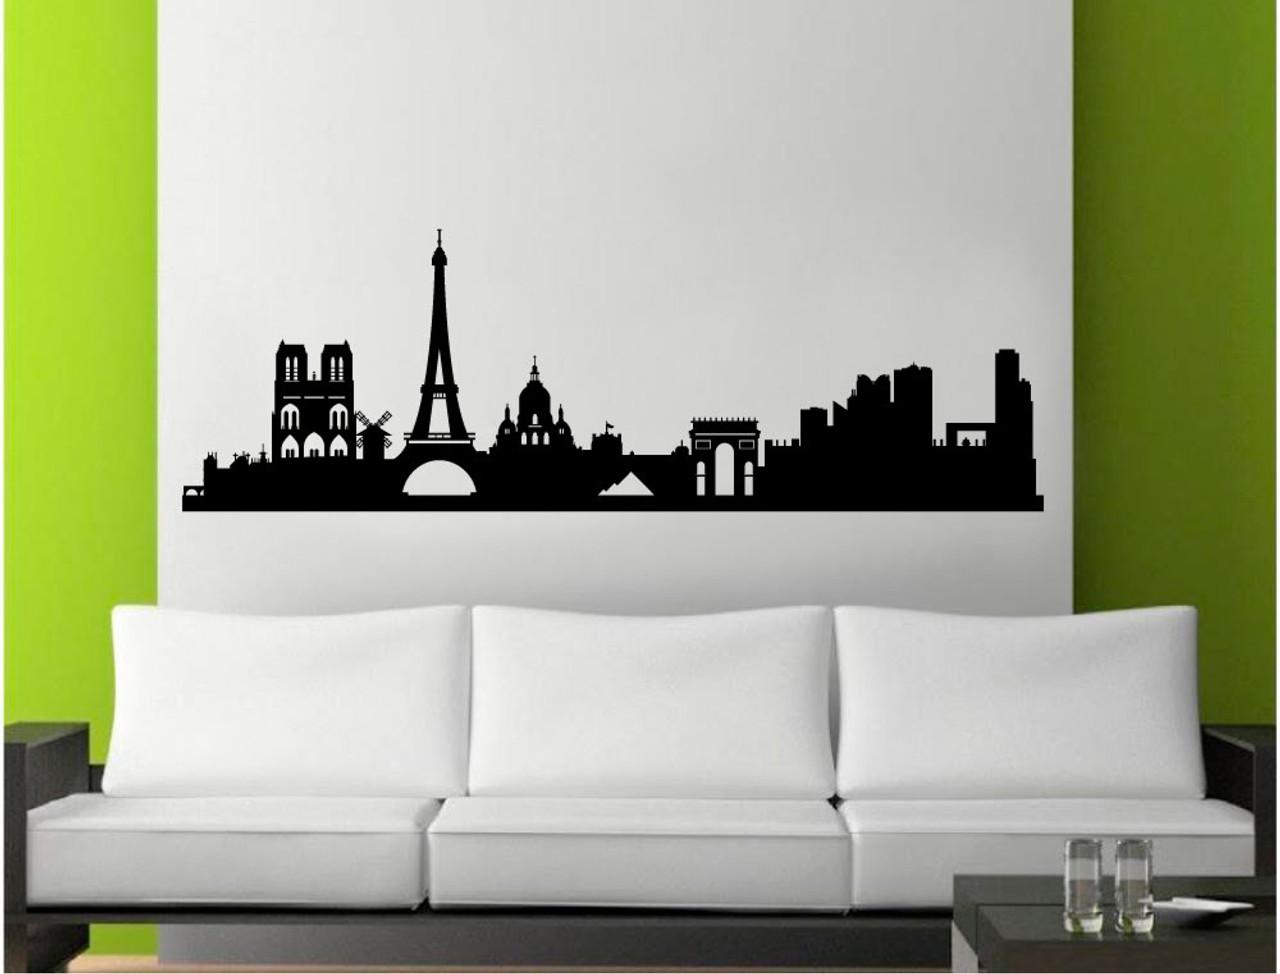 Paris wall sticker silhouette